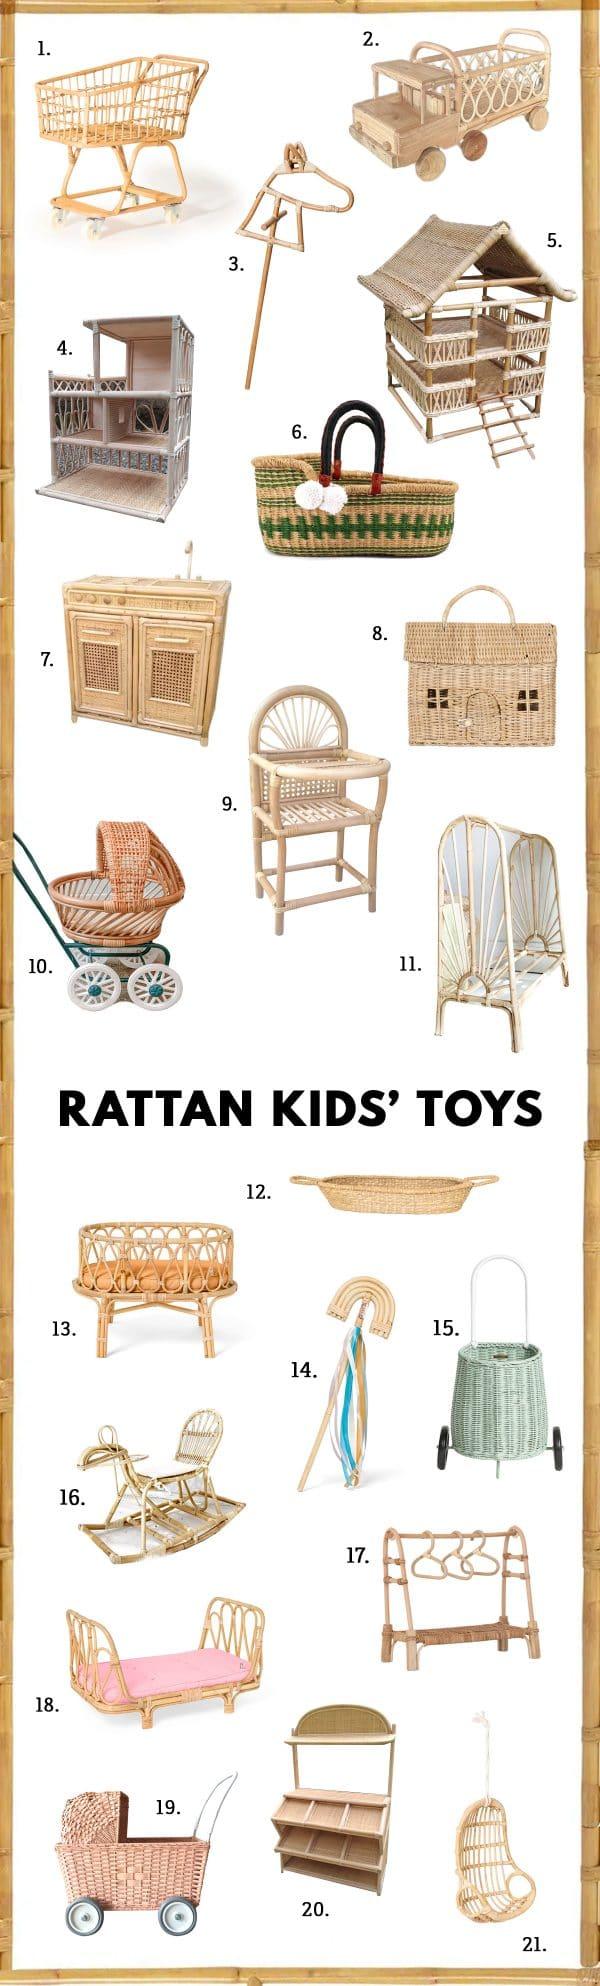 Rattan Kids Toys